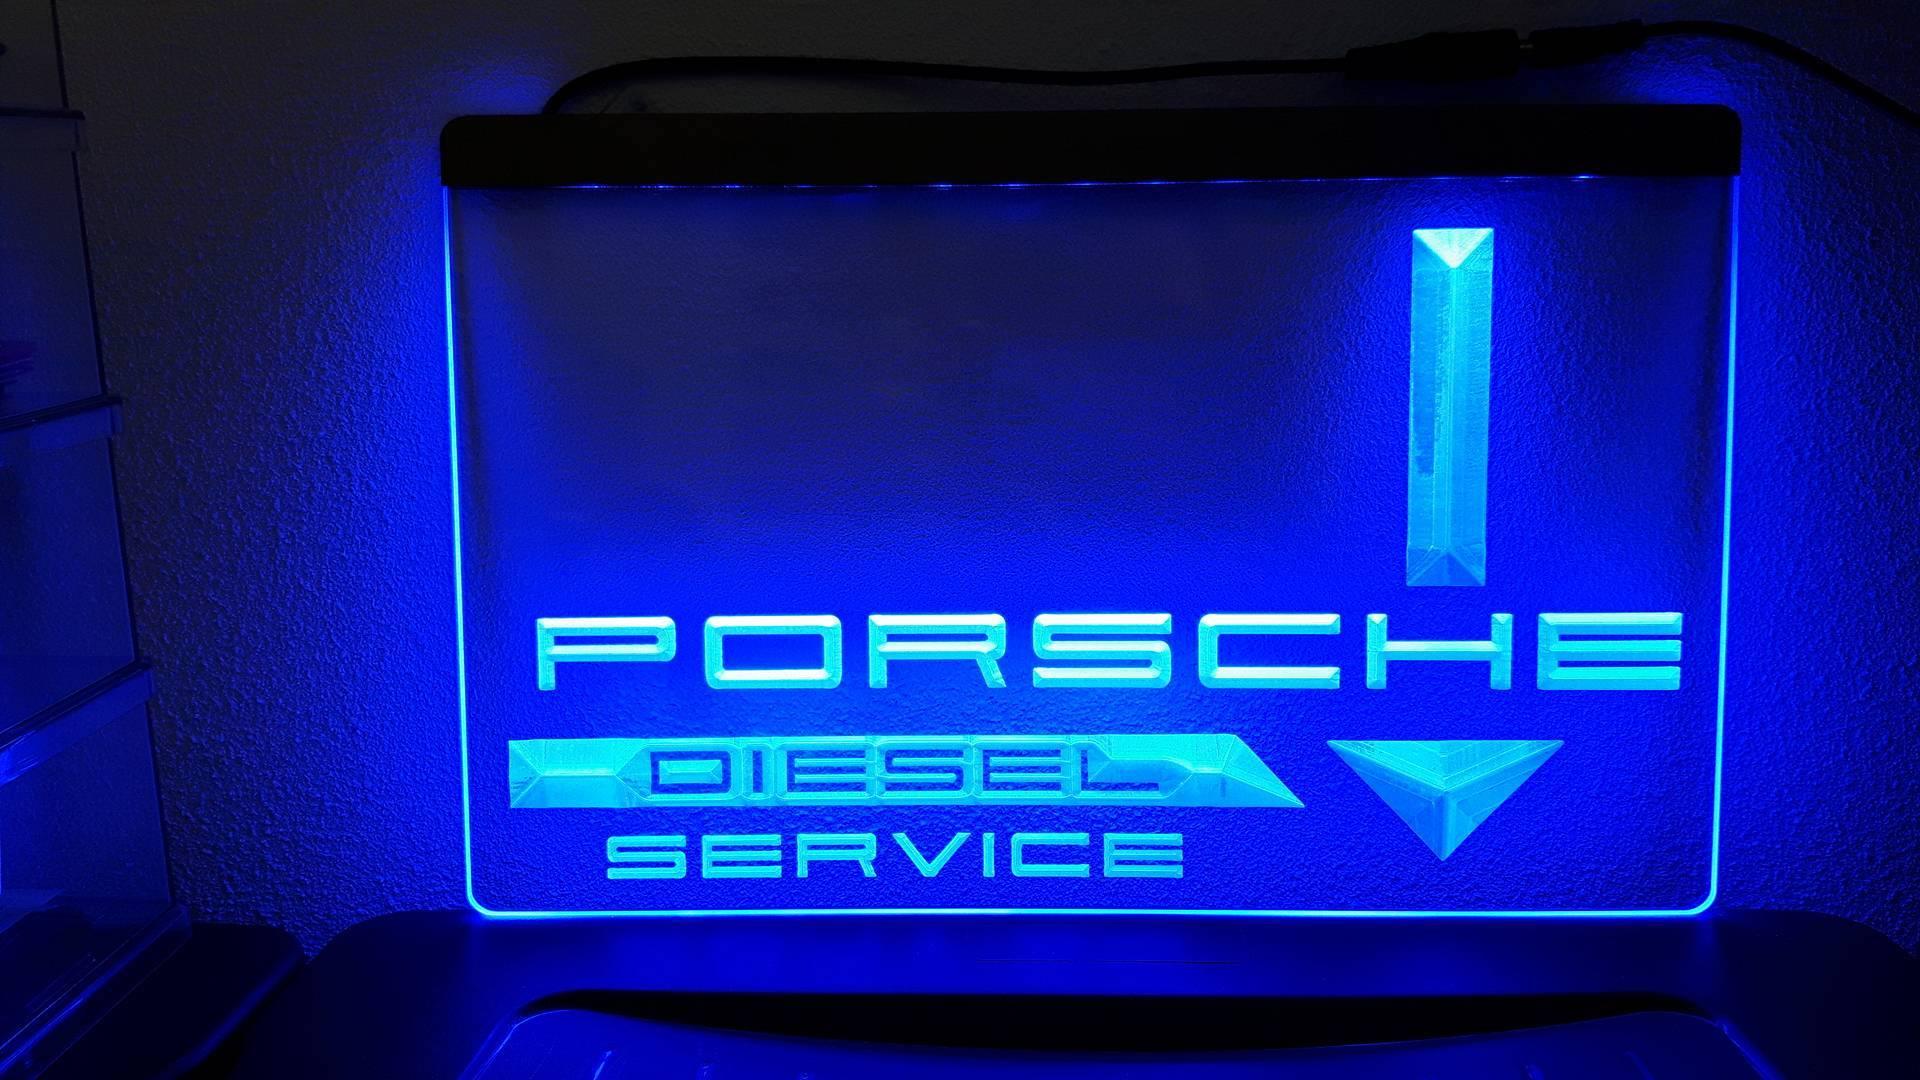 Porsche diesel tractor 3d logo led reclame verlichting for Tractor verlichting